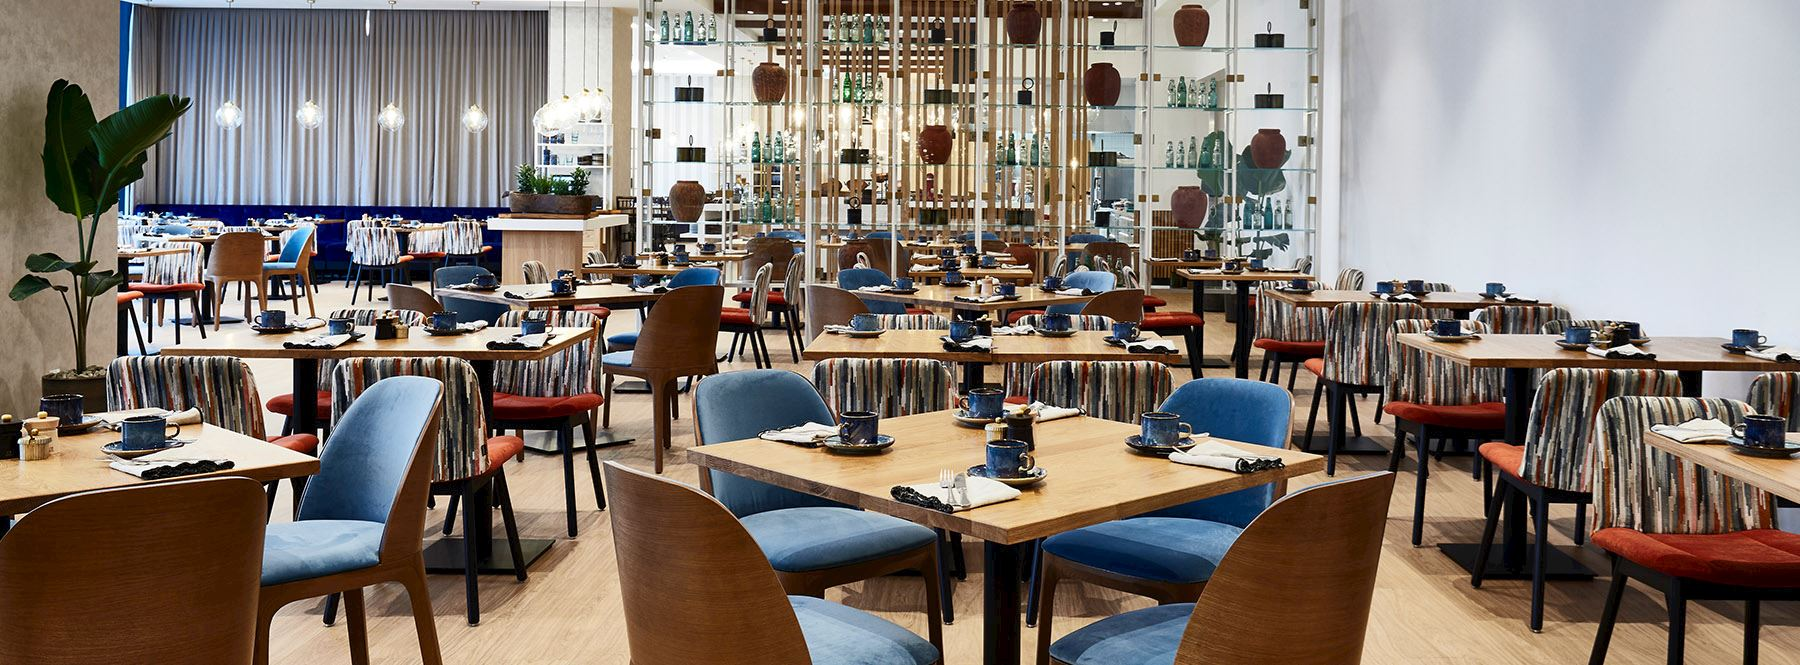 polish restaurant warsaw